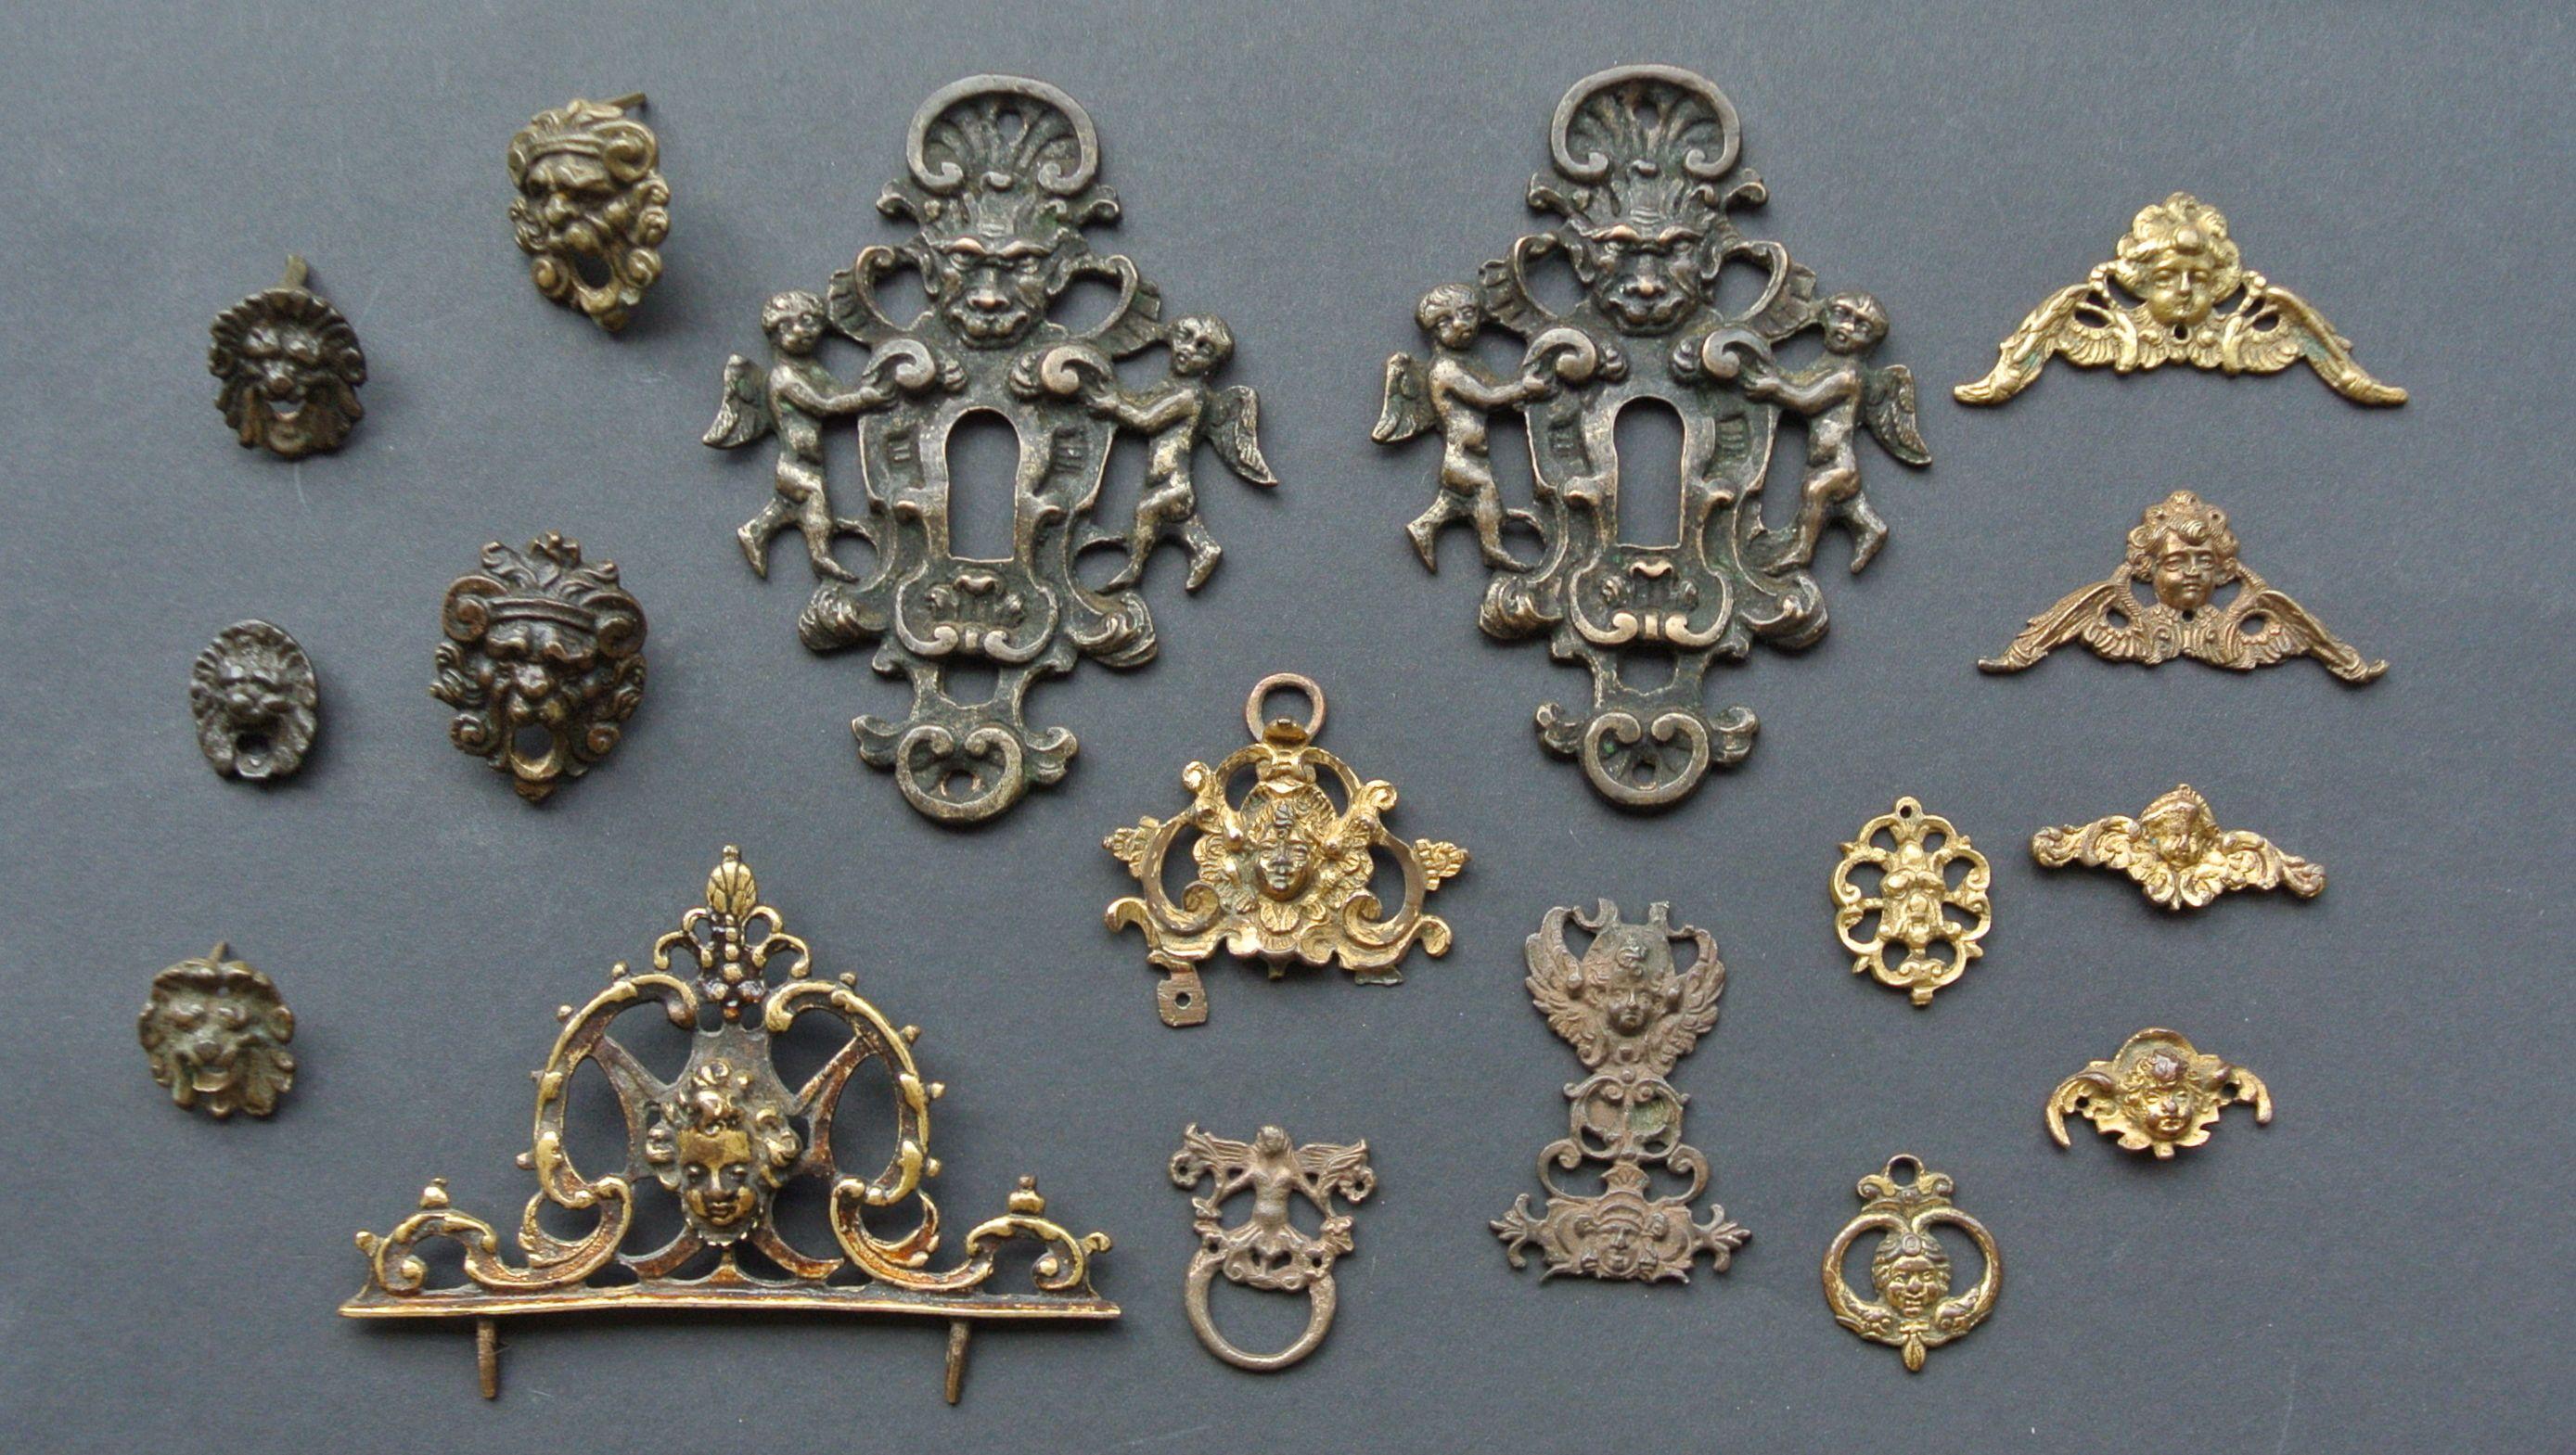 Renaissance Möbel-Rahmen-Beschläge 1550 - 1600 | renaissance ...